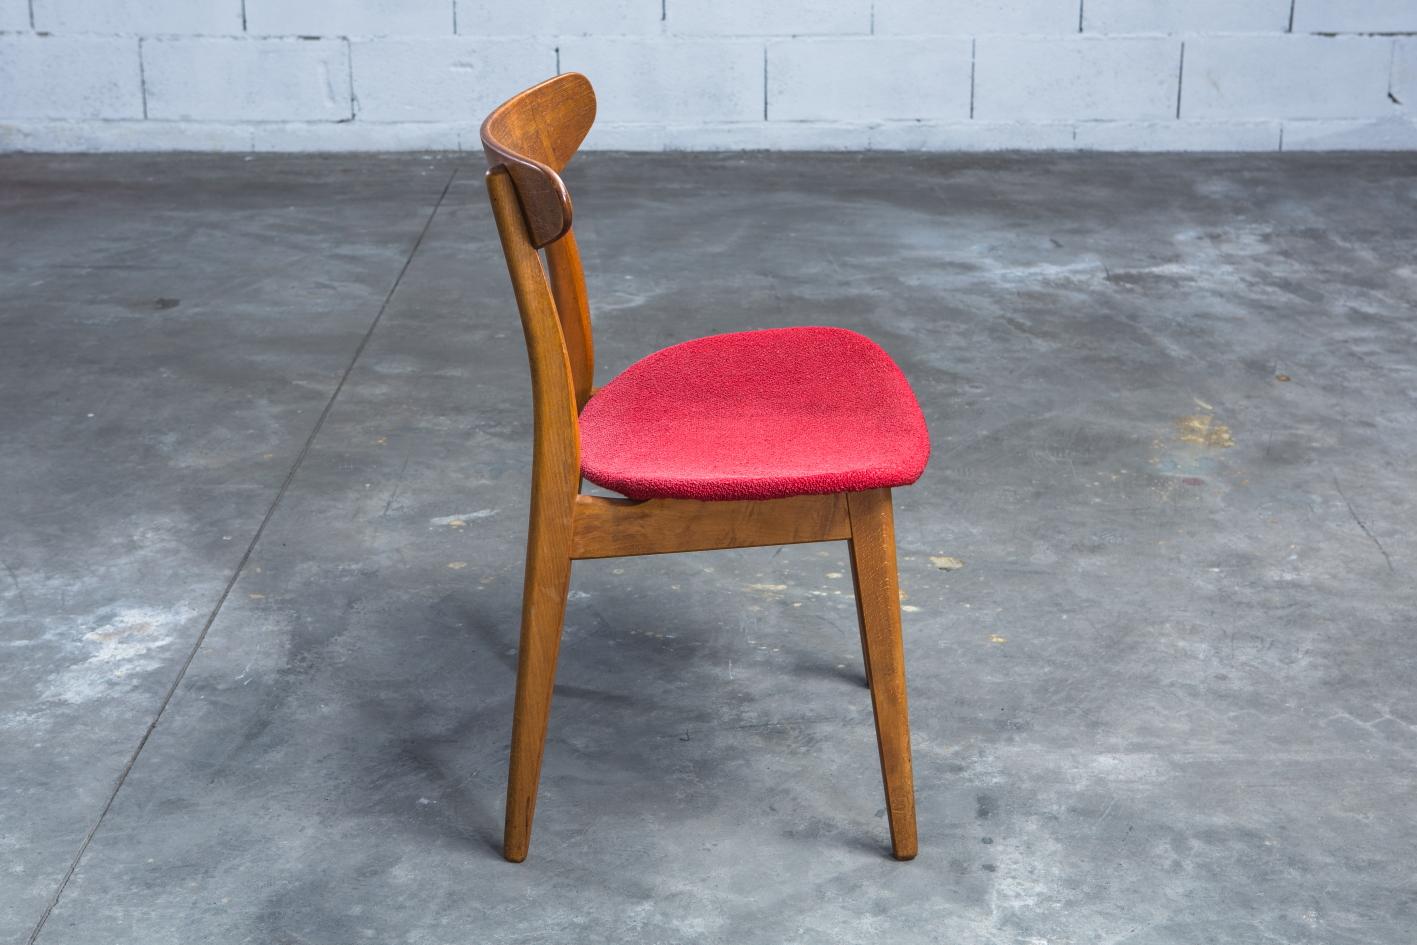 CH 30 chairs - Hans J. Wegner for Carl Hansen - Side view